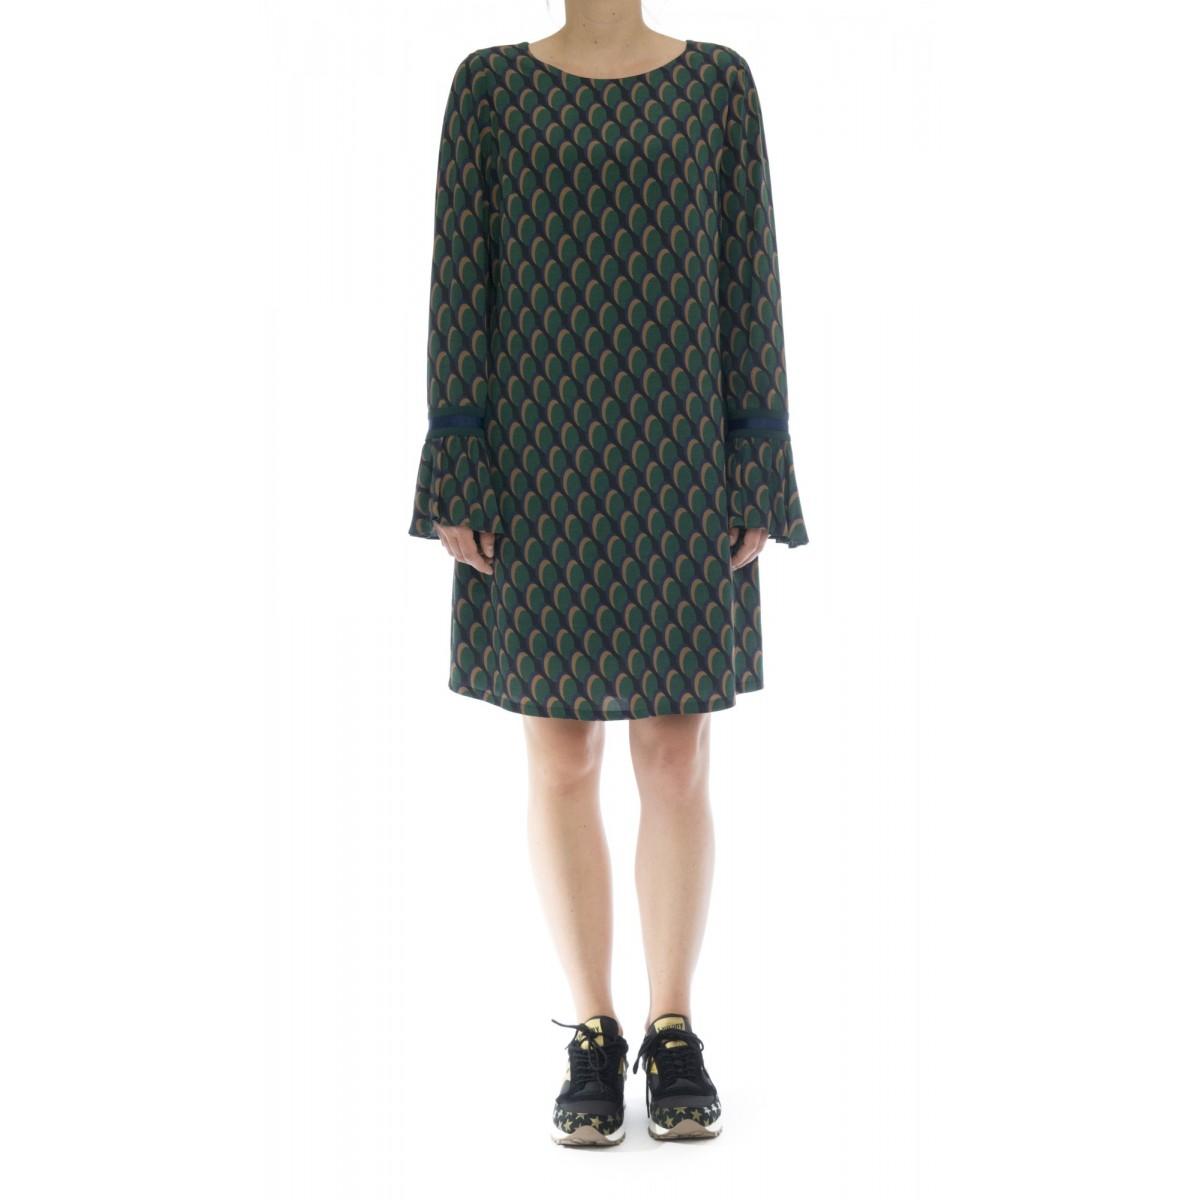 Vestito - Yoshik vestito stampa